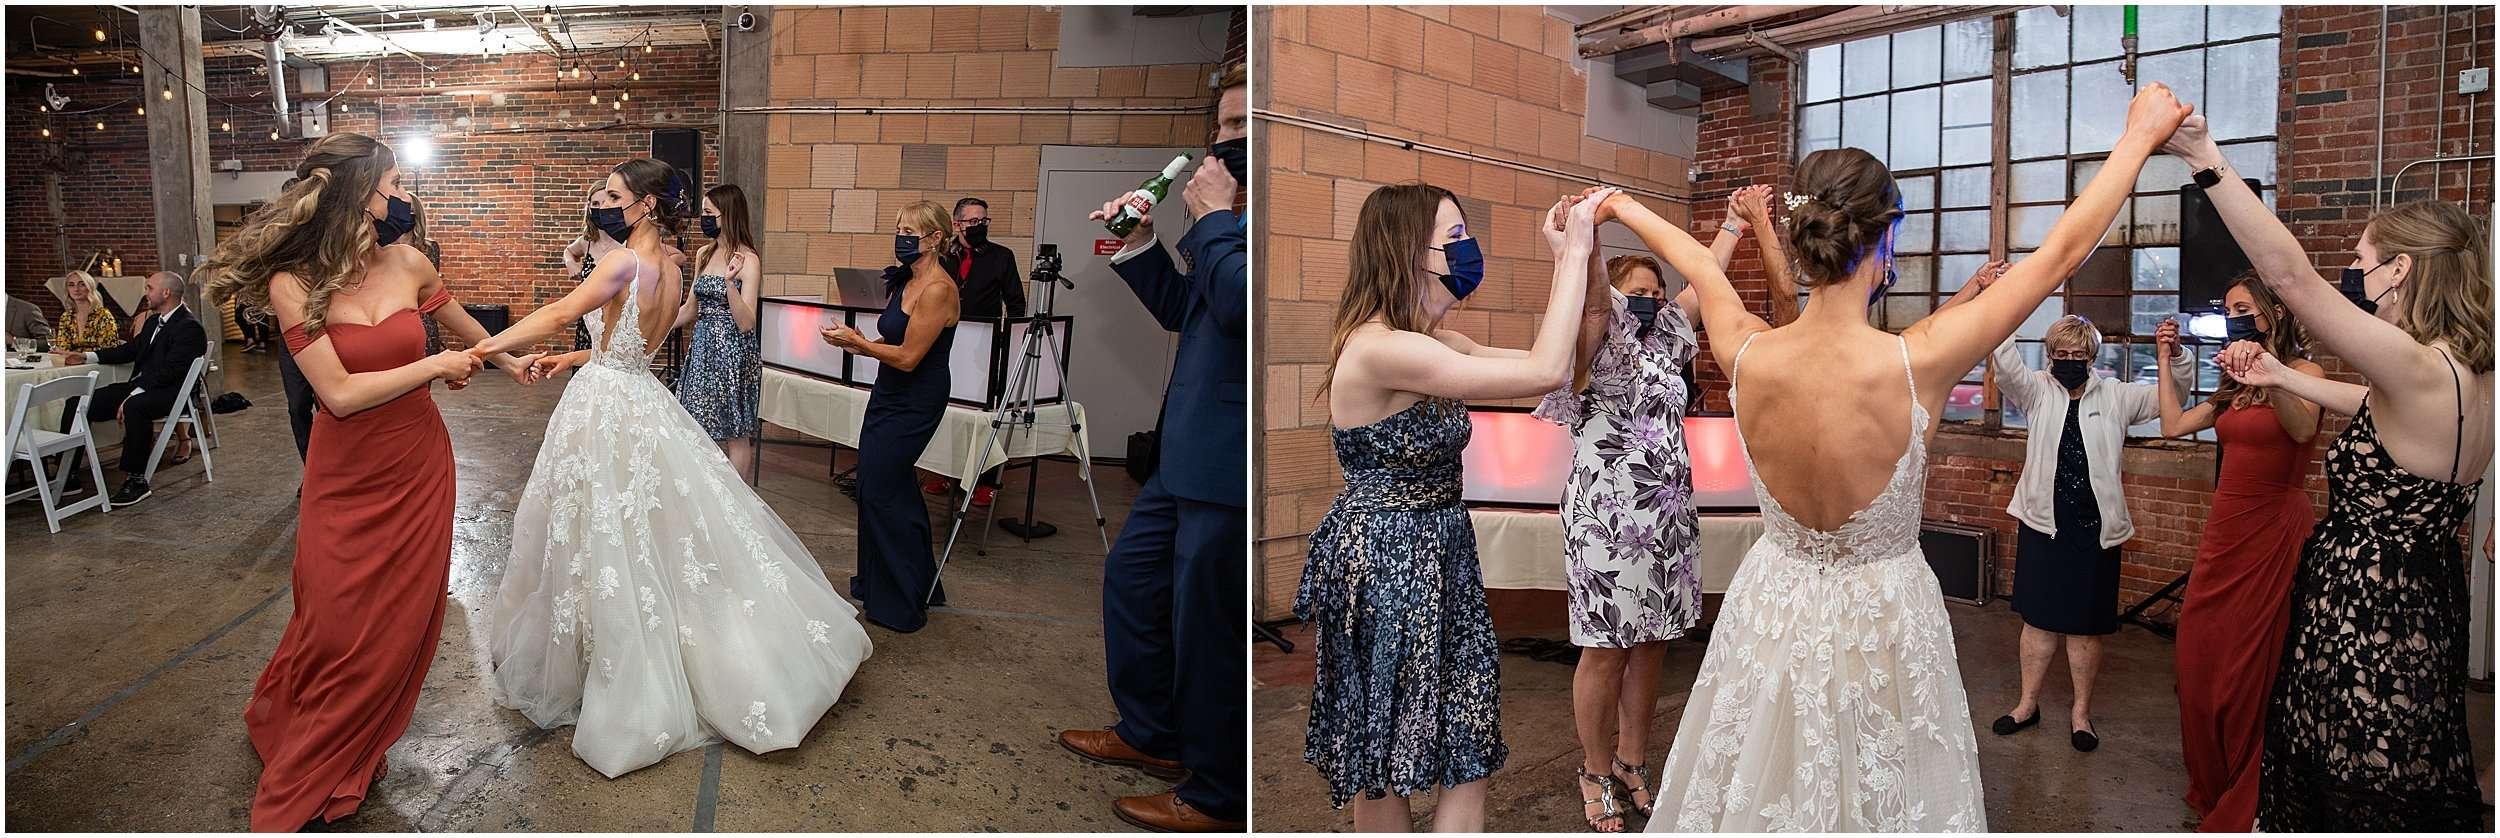 Columbus, Ohio Wedding Photography | Strongwater Events 226